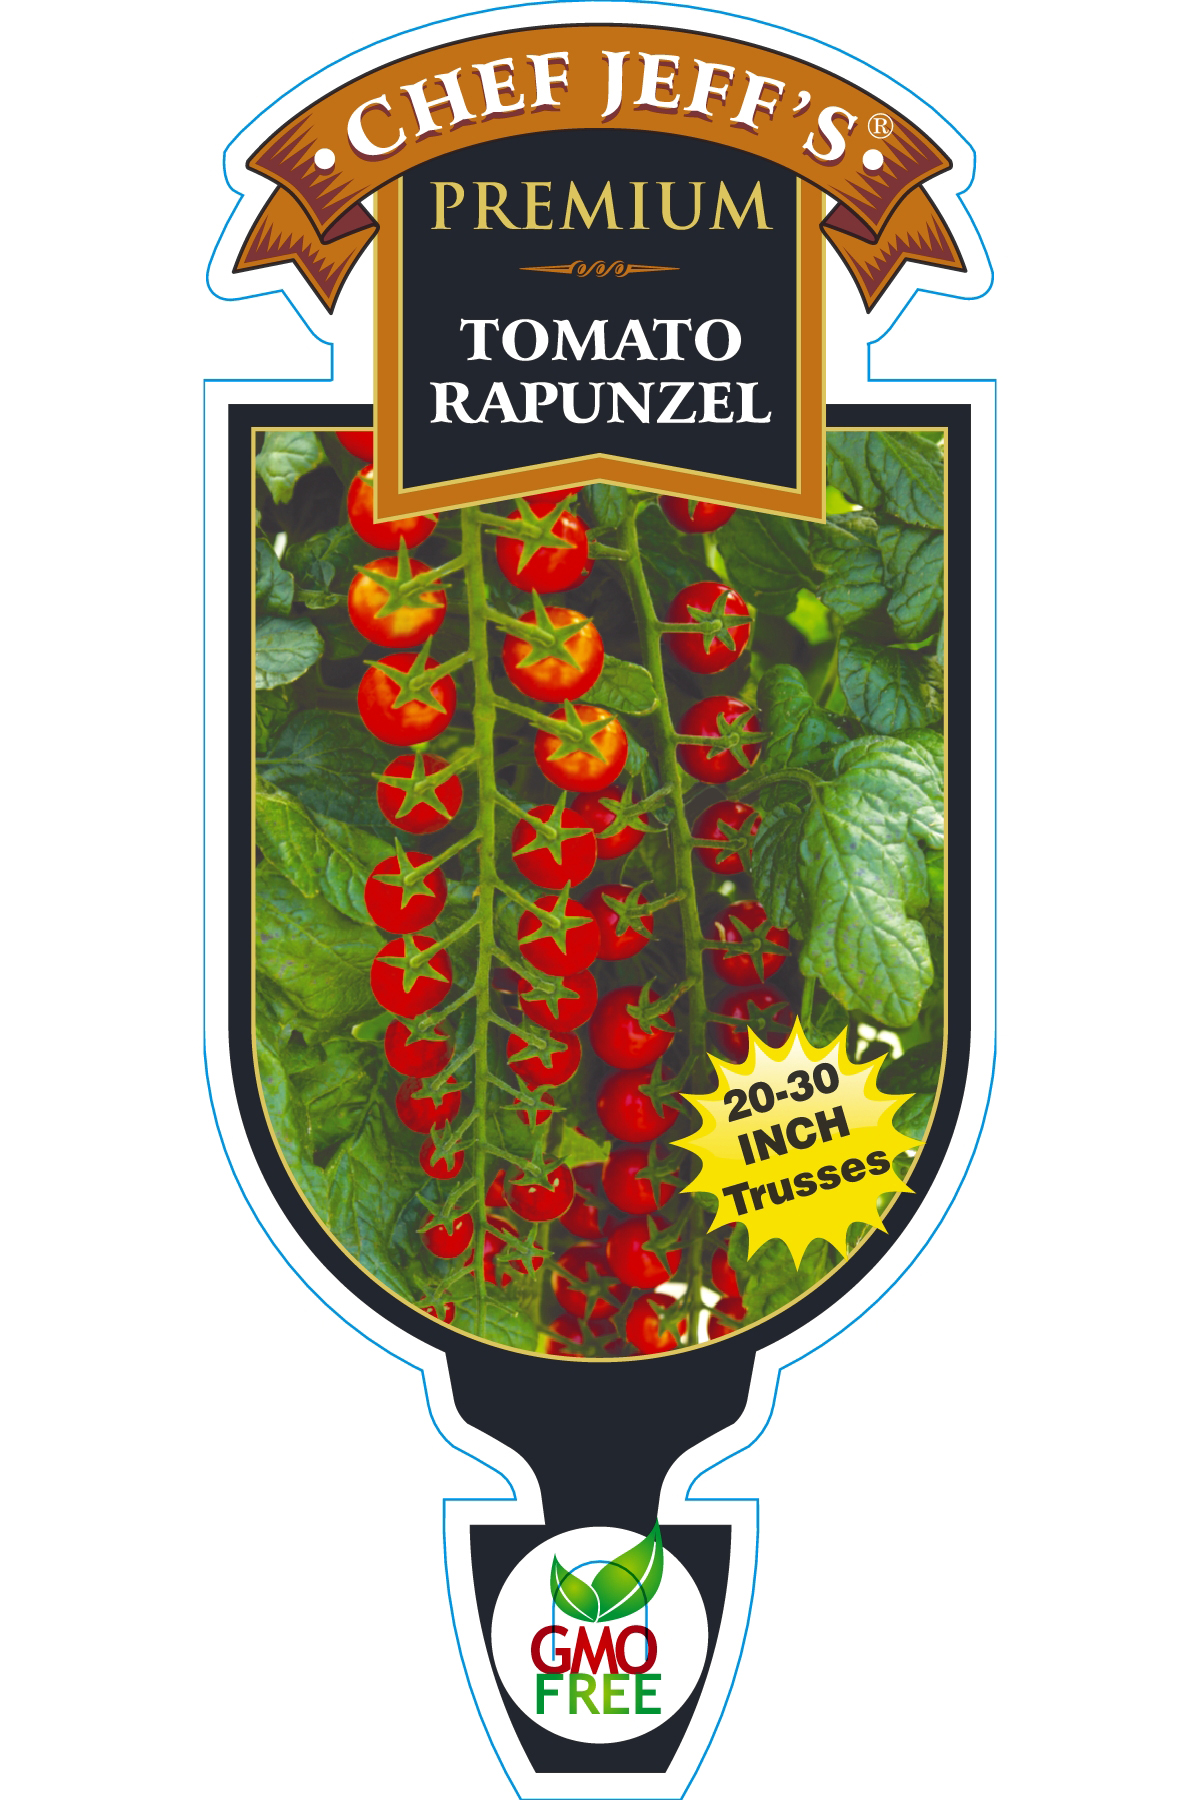 Tomato Rapunzel